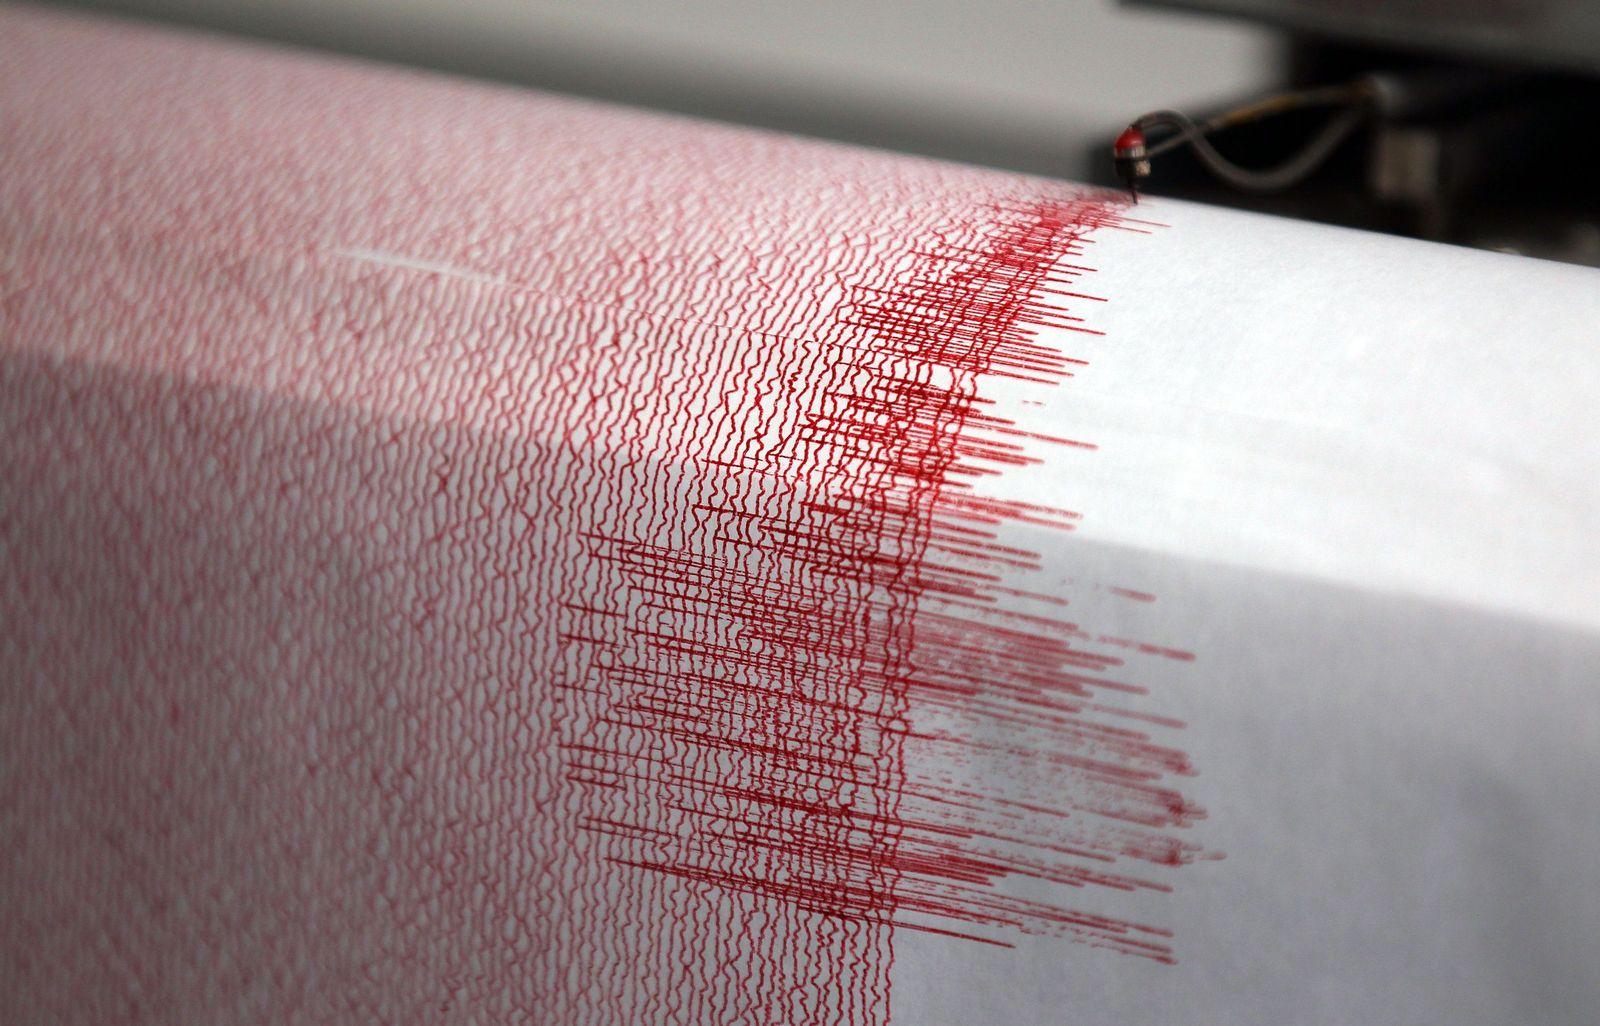 Erdbeben/ Seismograph/ Symbolbild